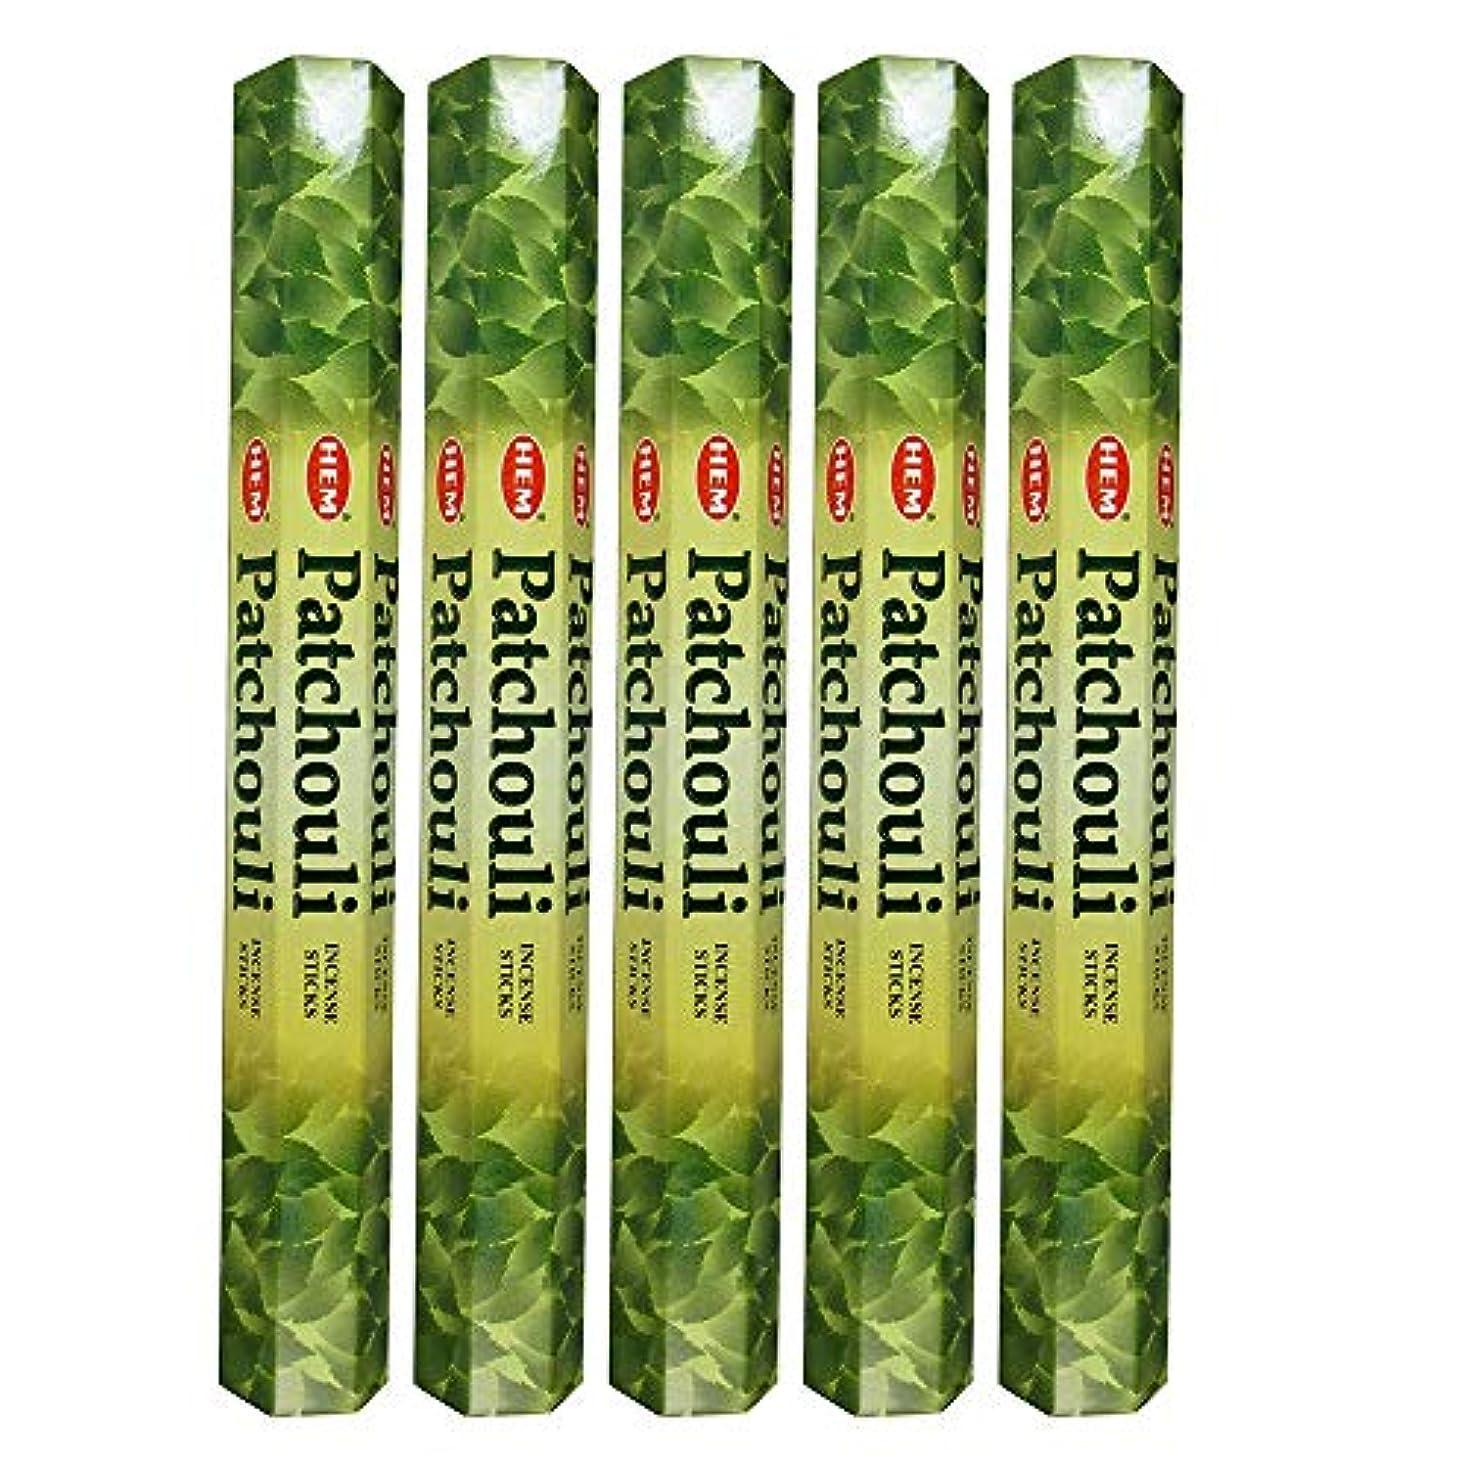 Hemパチョリ100 Incense Sticks (5 x 20スティックパック)